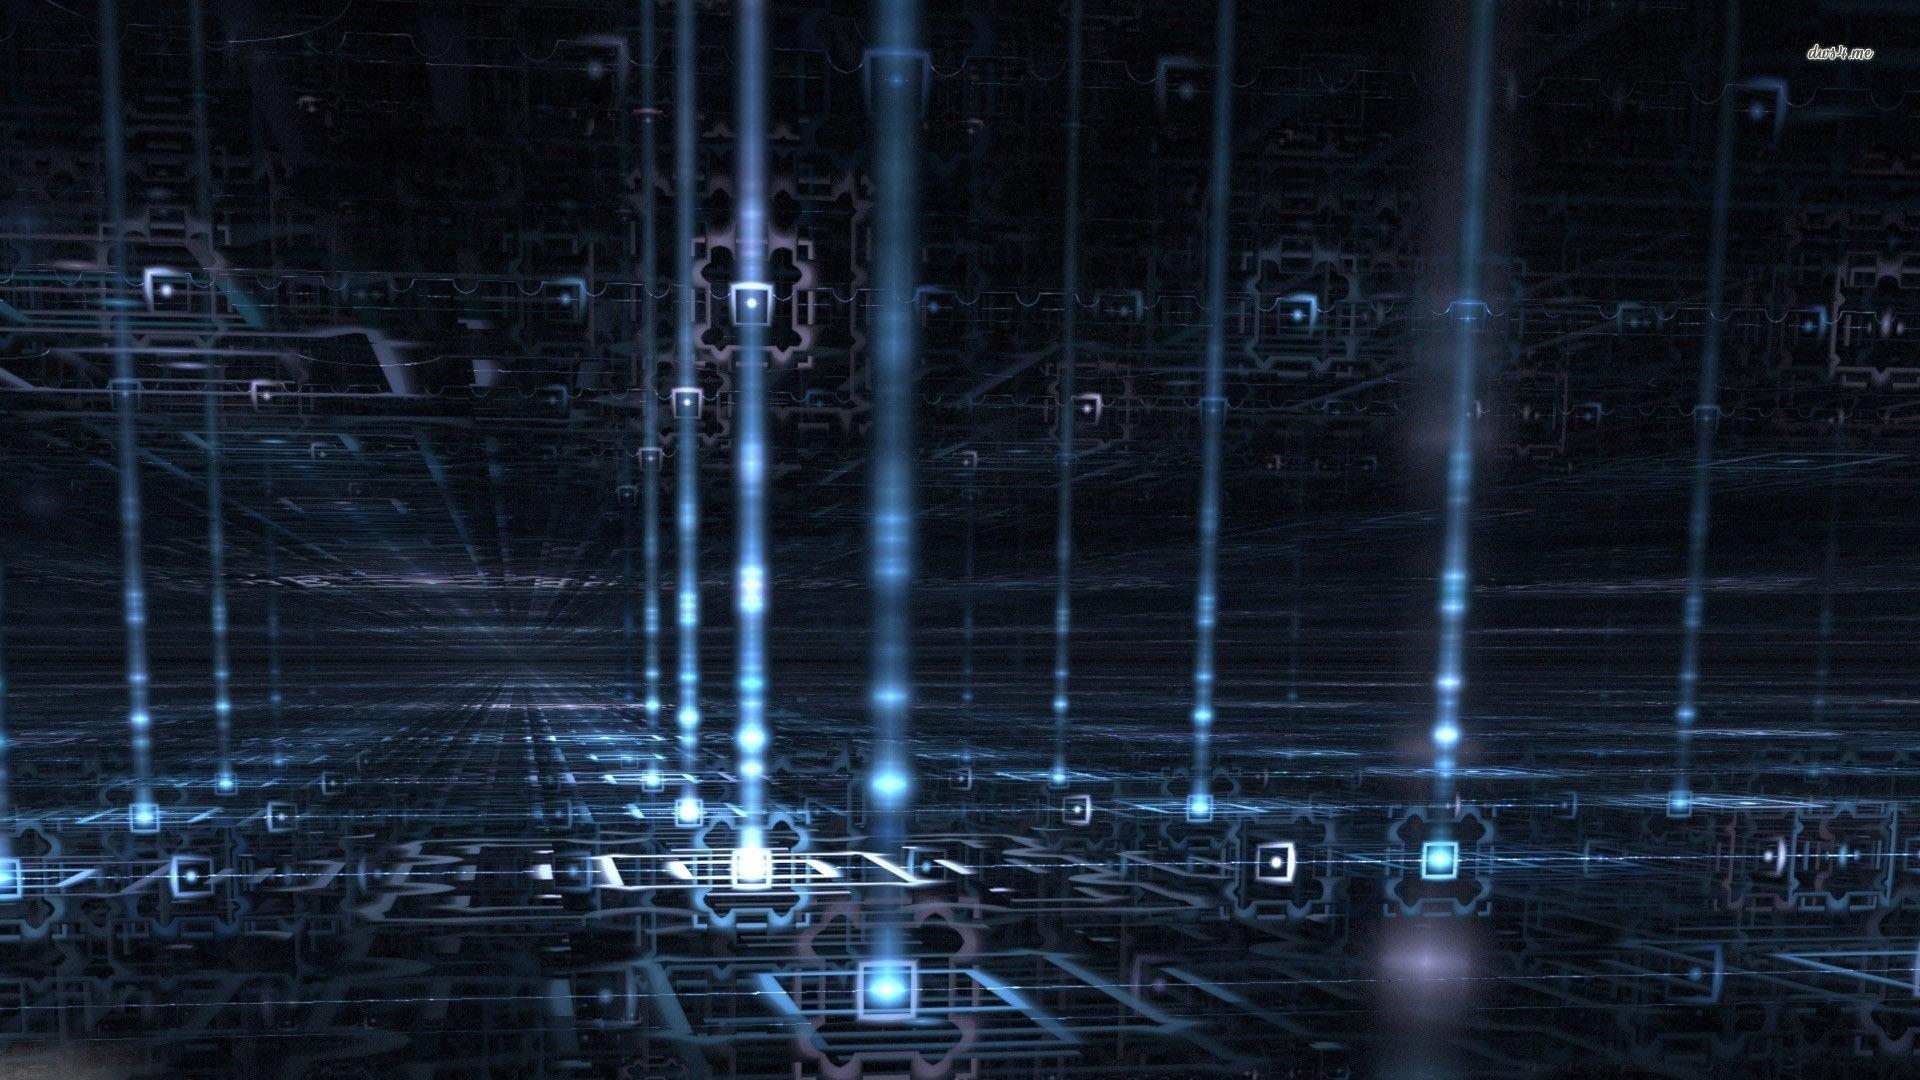 Virtual Reality Wallpaper 42739 | NEWSMOV Christian Bale